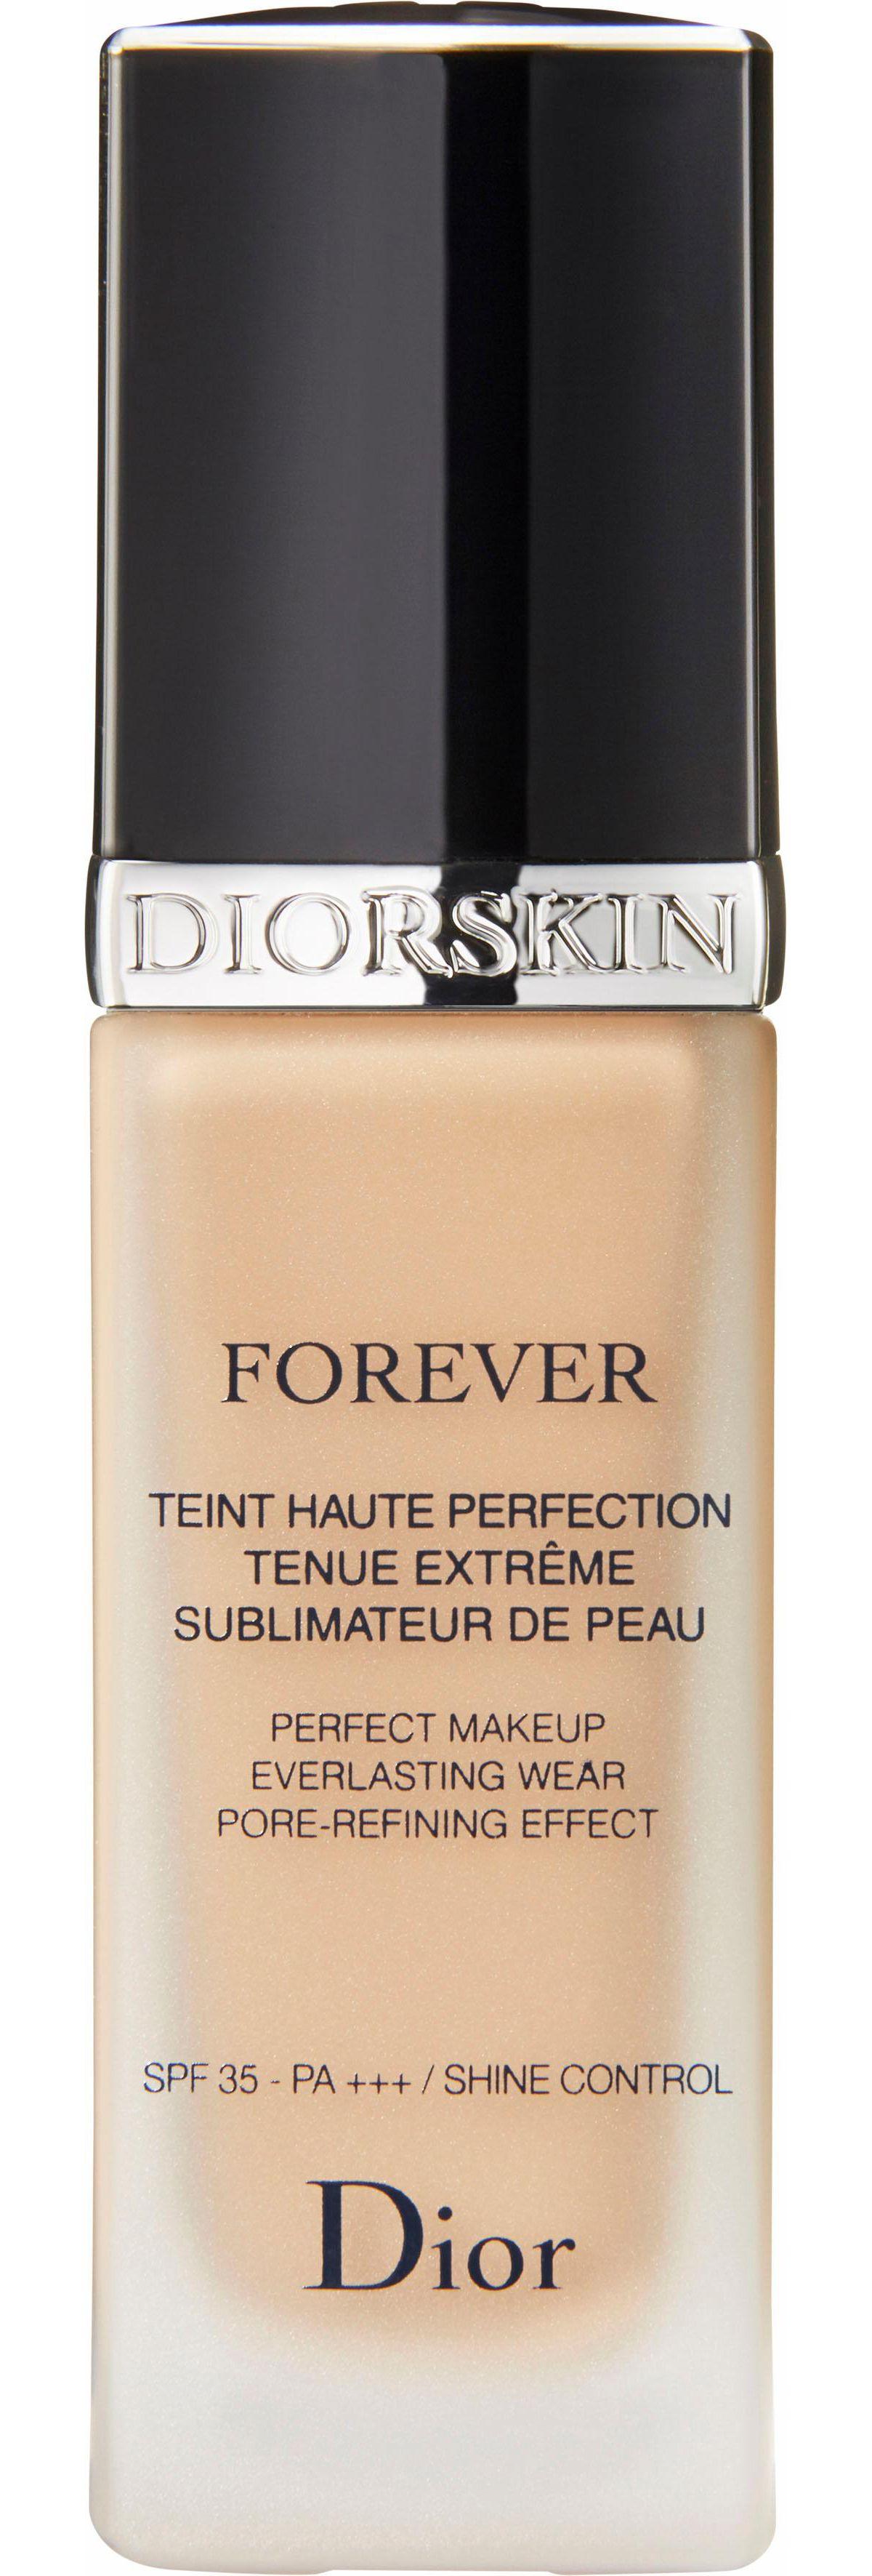 Dior, »Diorskin Forever«, Foundation